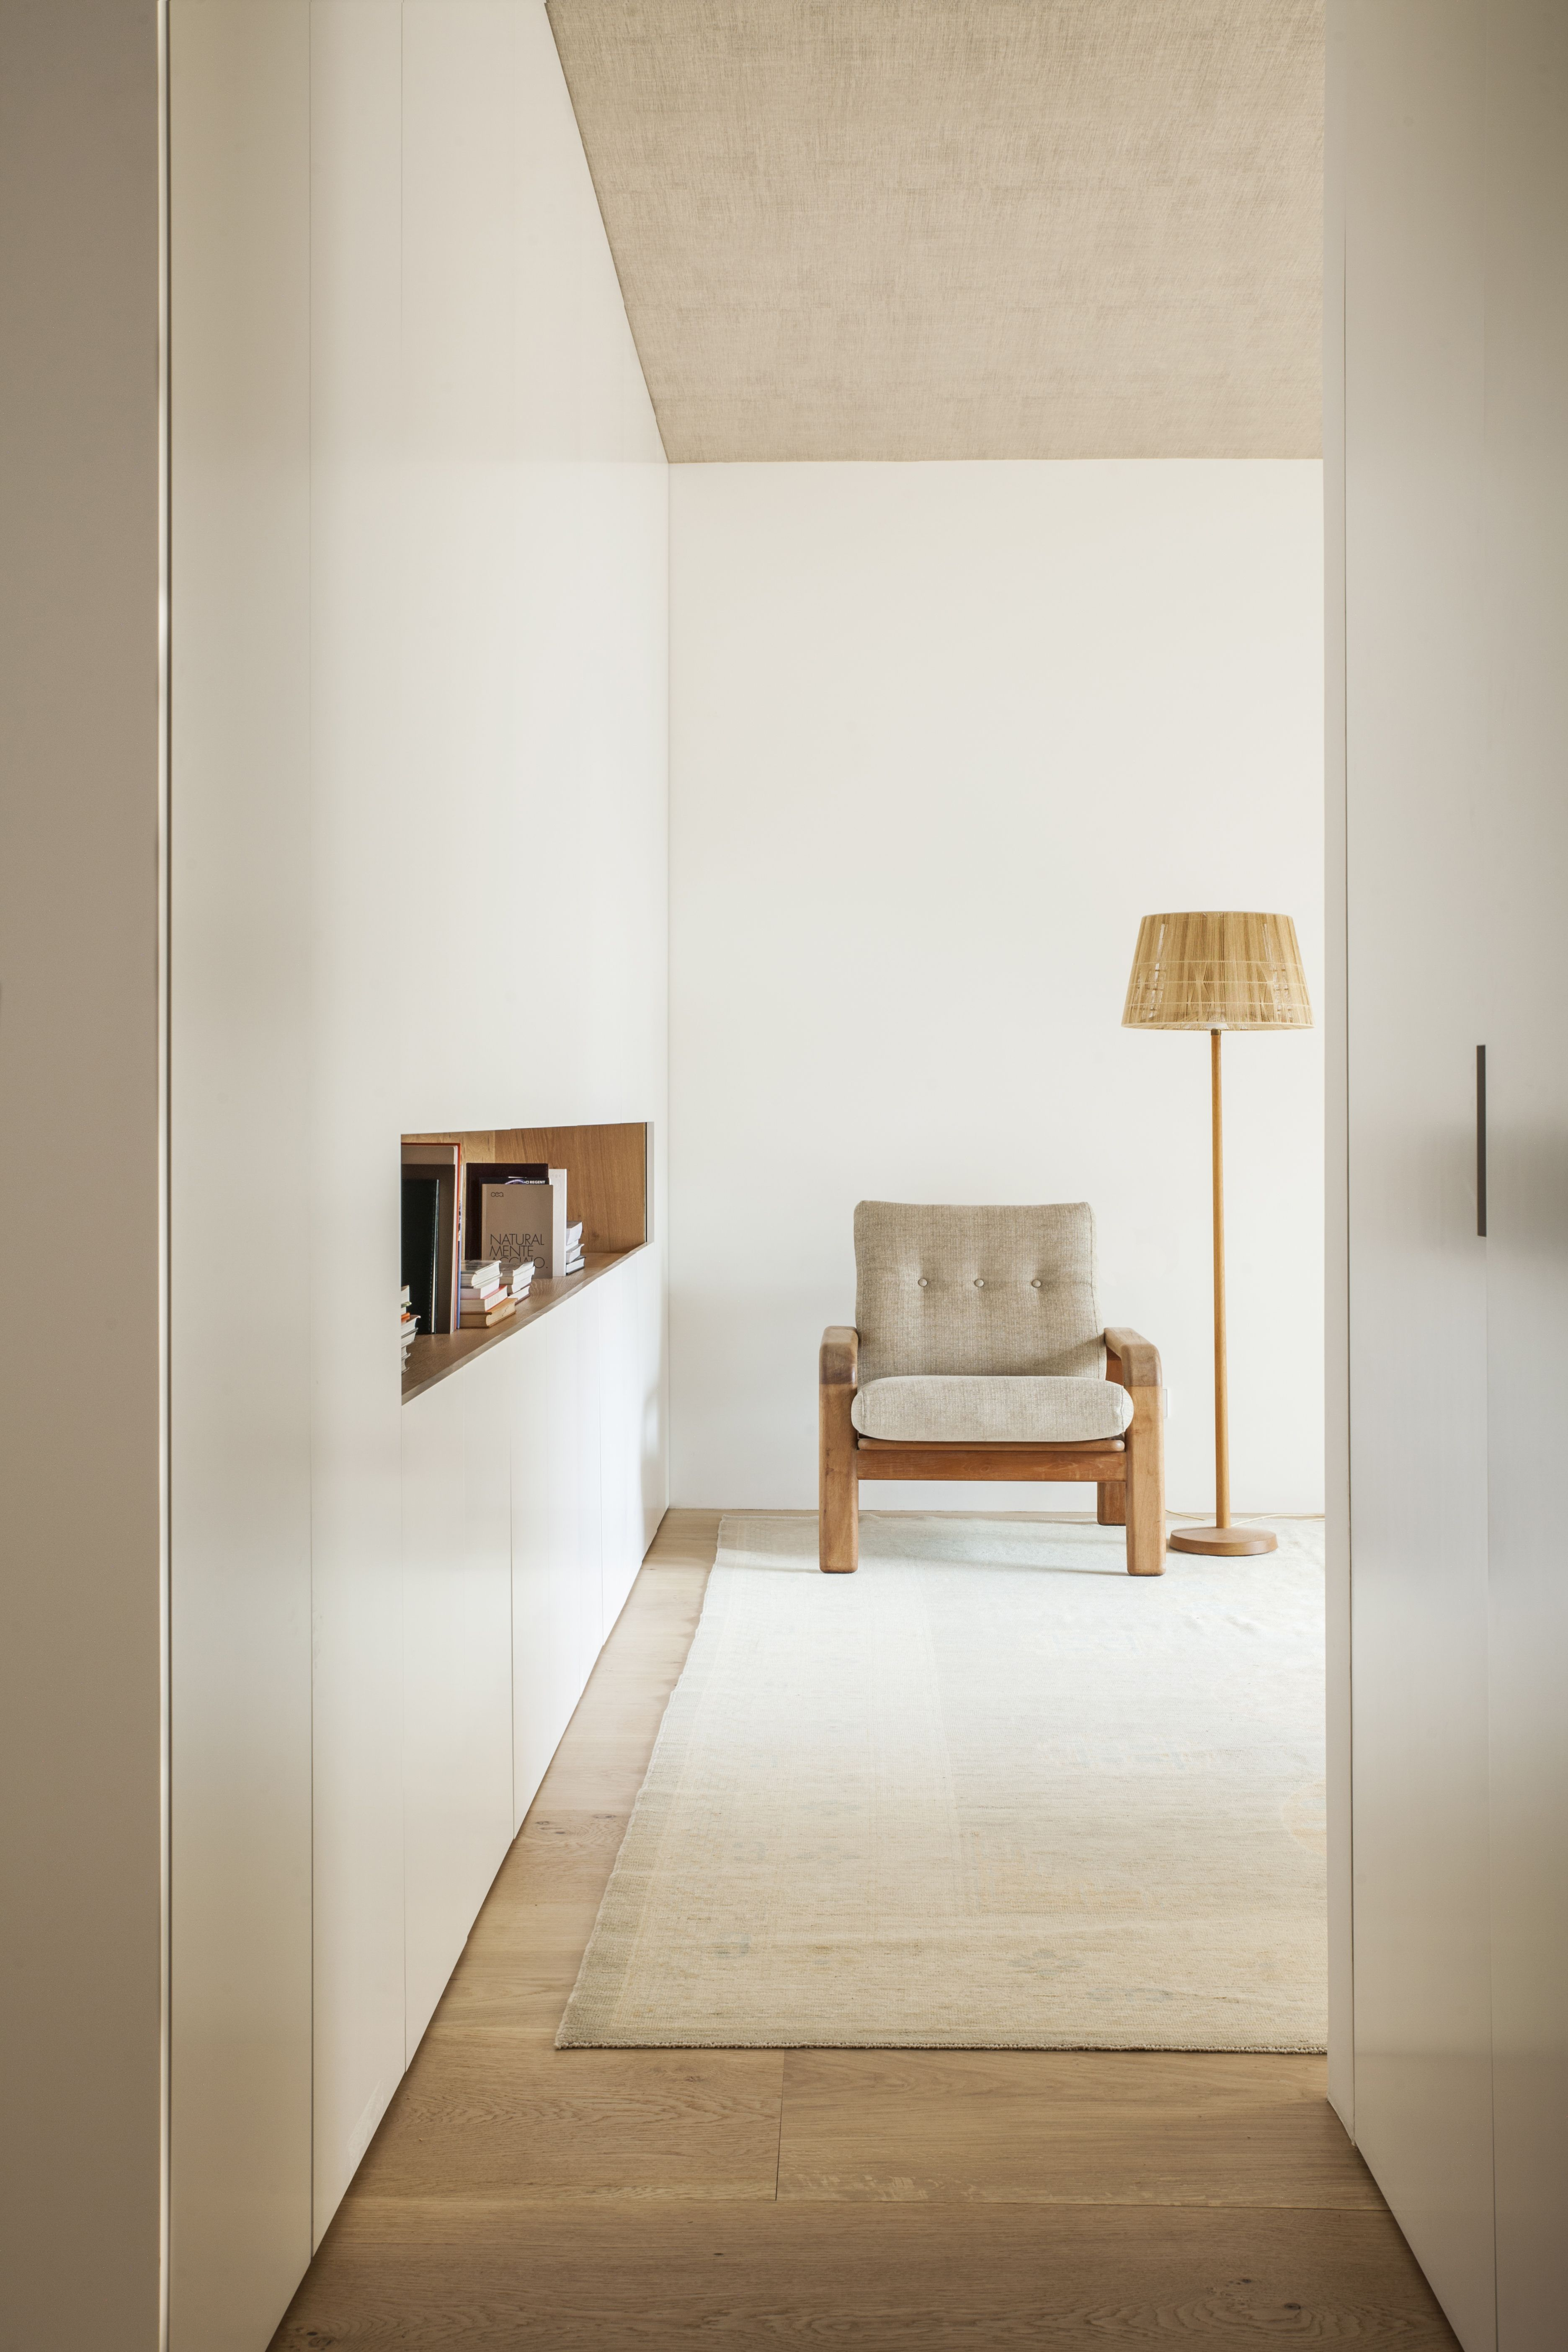 LAGASCA OOAA Arquitectura en 2020 Diseño de interiores